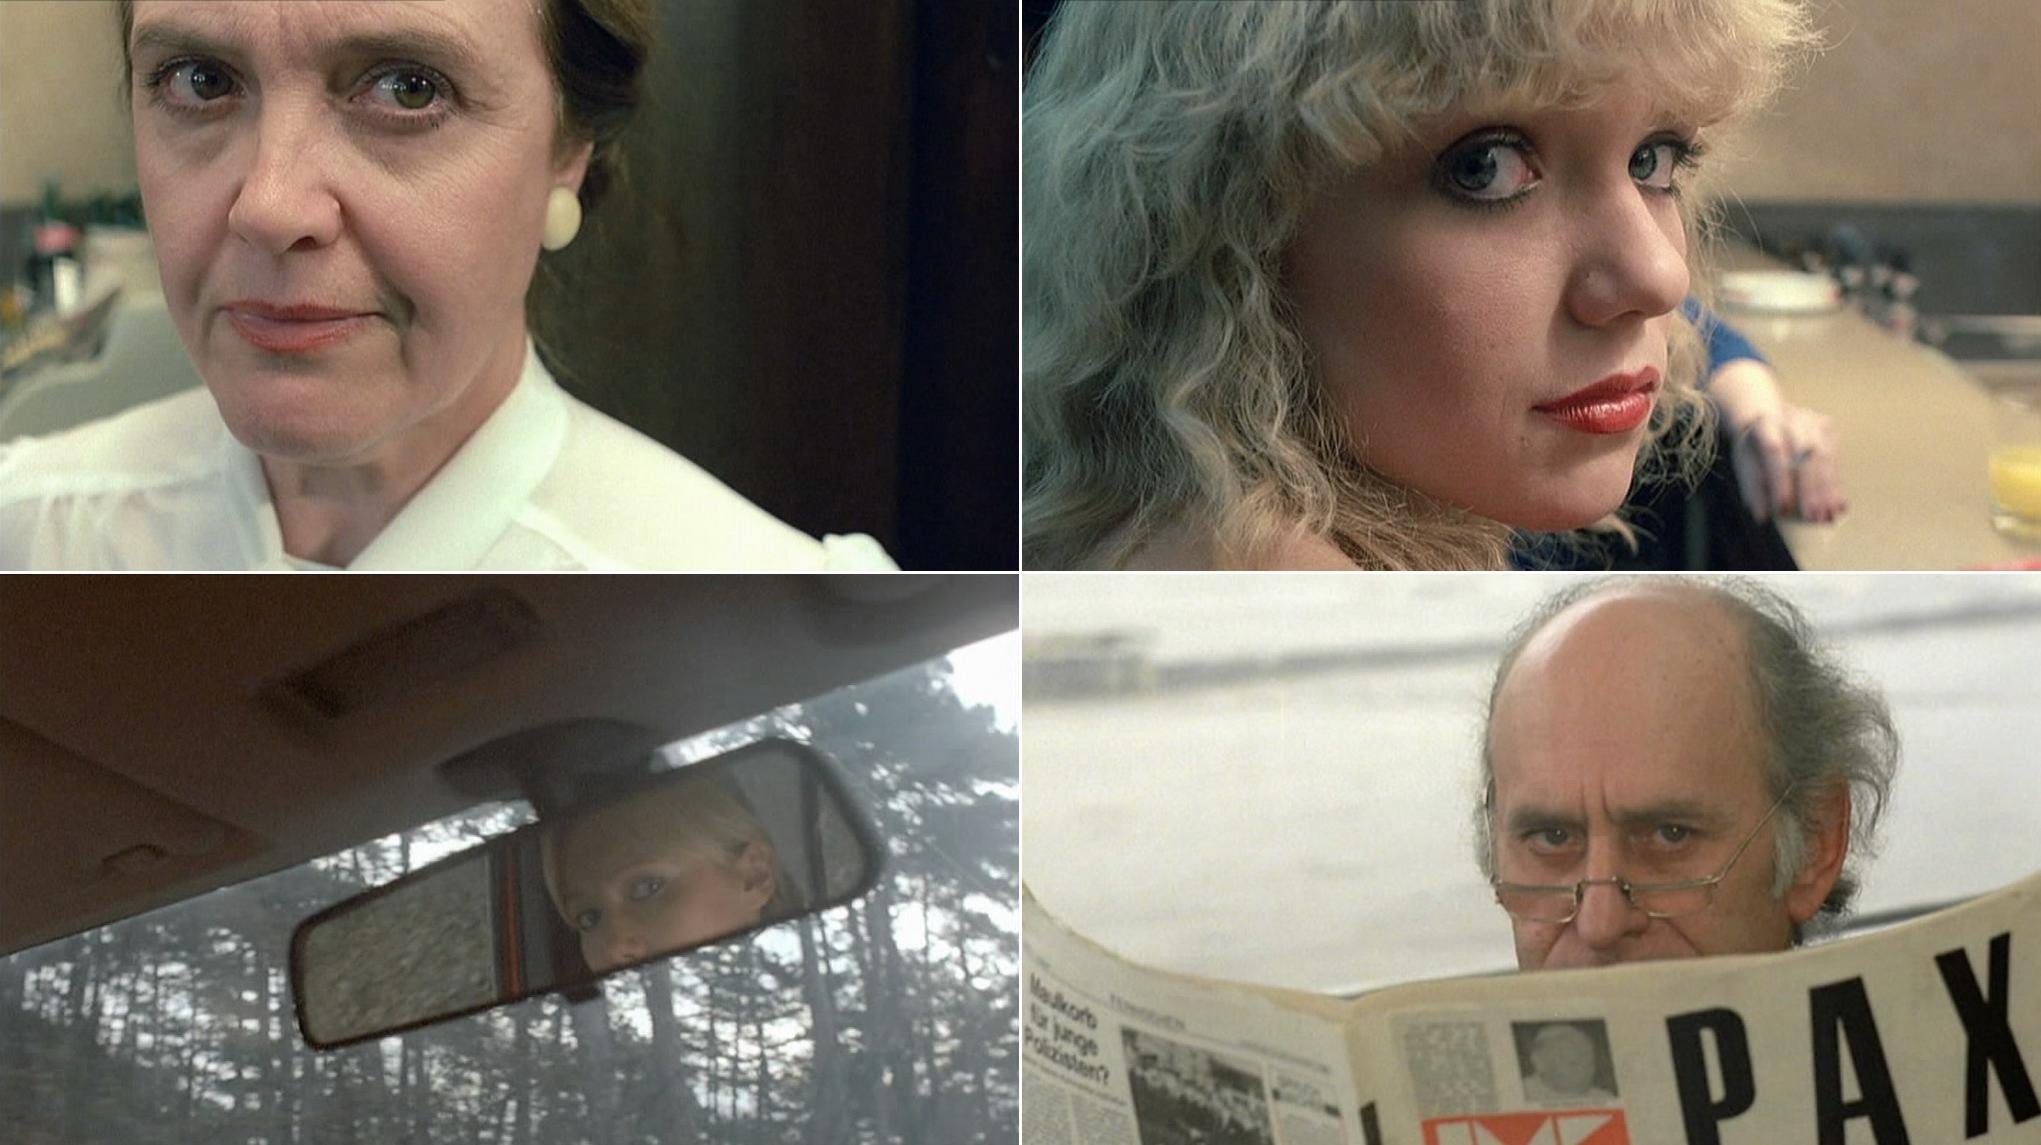 angst-1983-film-ache.jpg